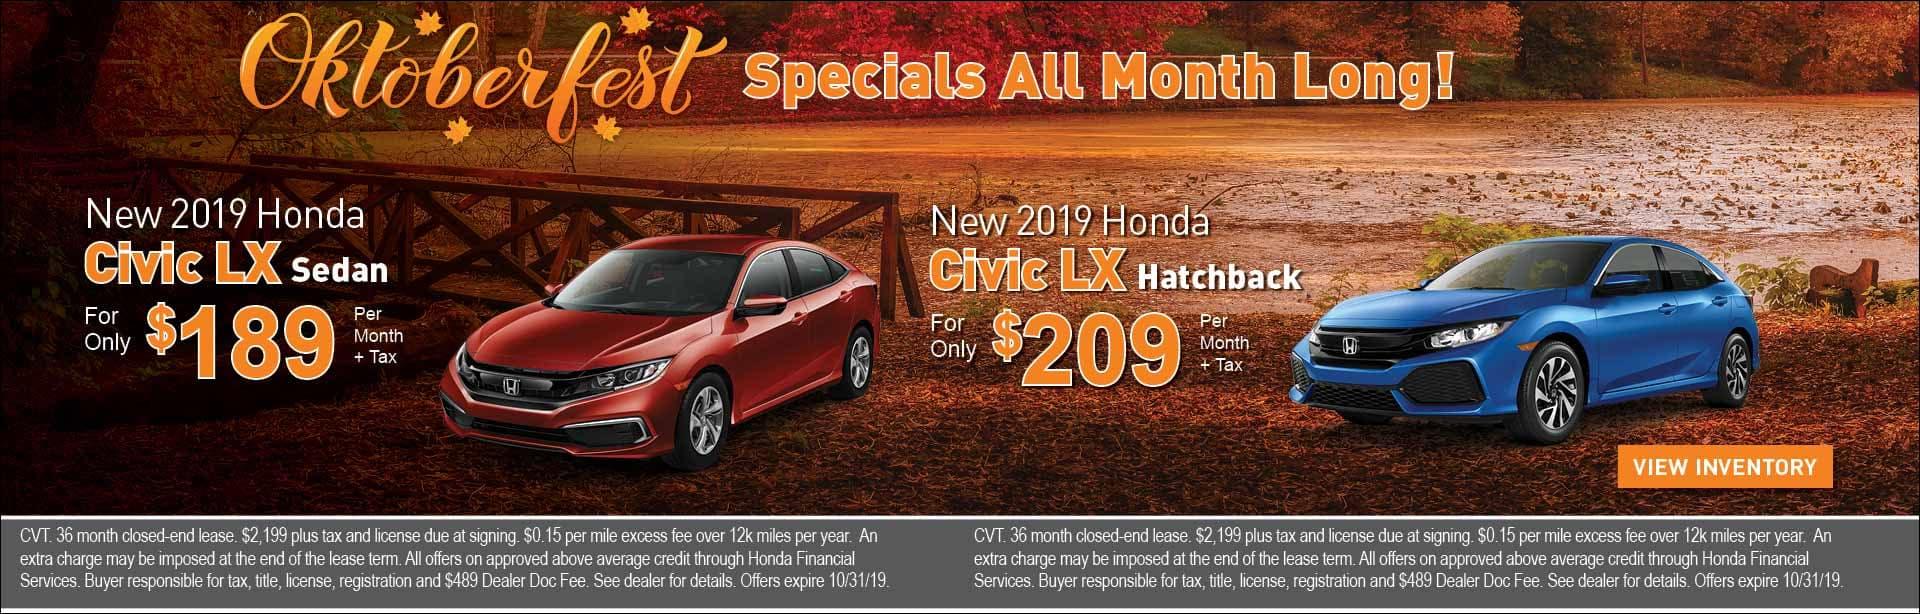 Civic LX Hatchback